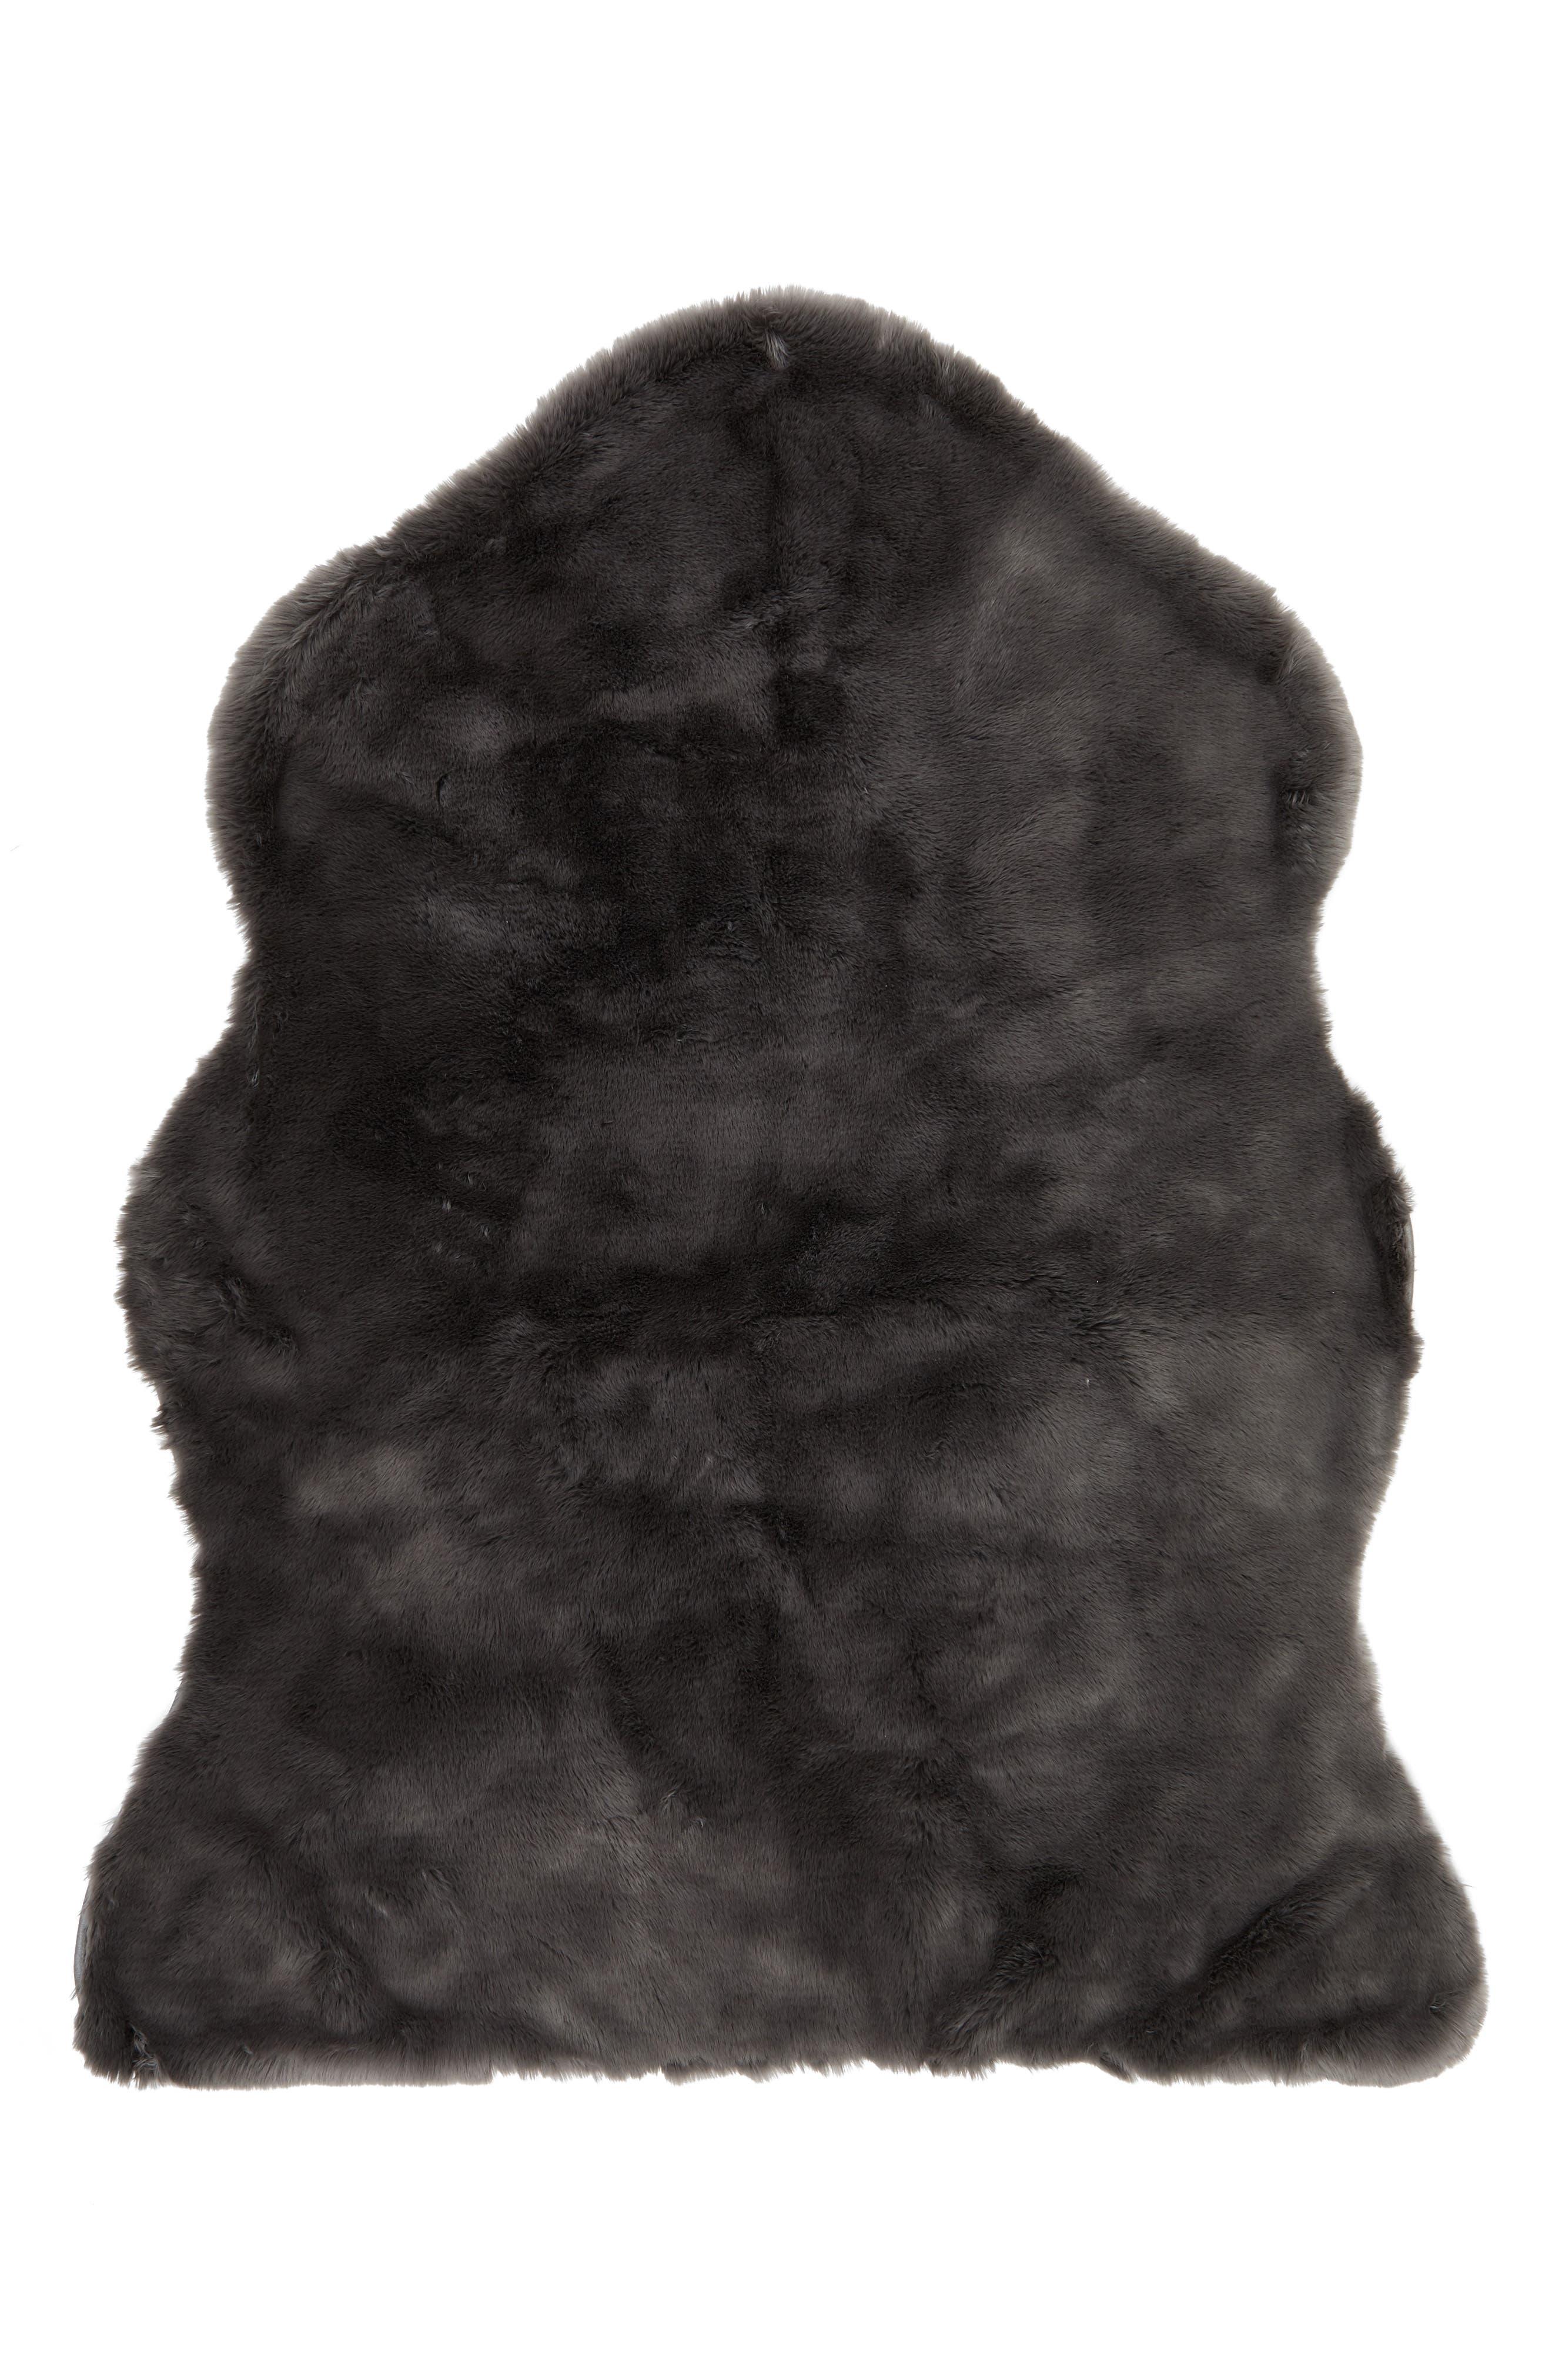 Cuddle Up Faux Fur Shaped Rug,                         Main,                         color, 021